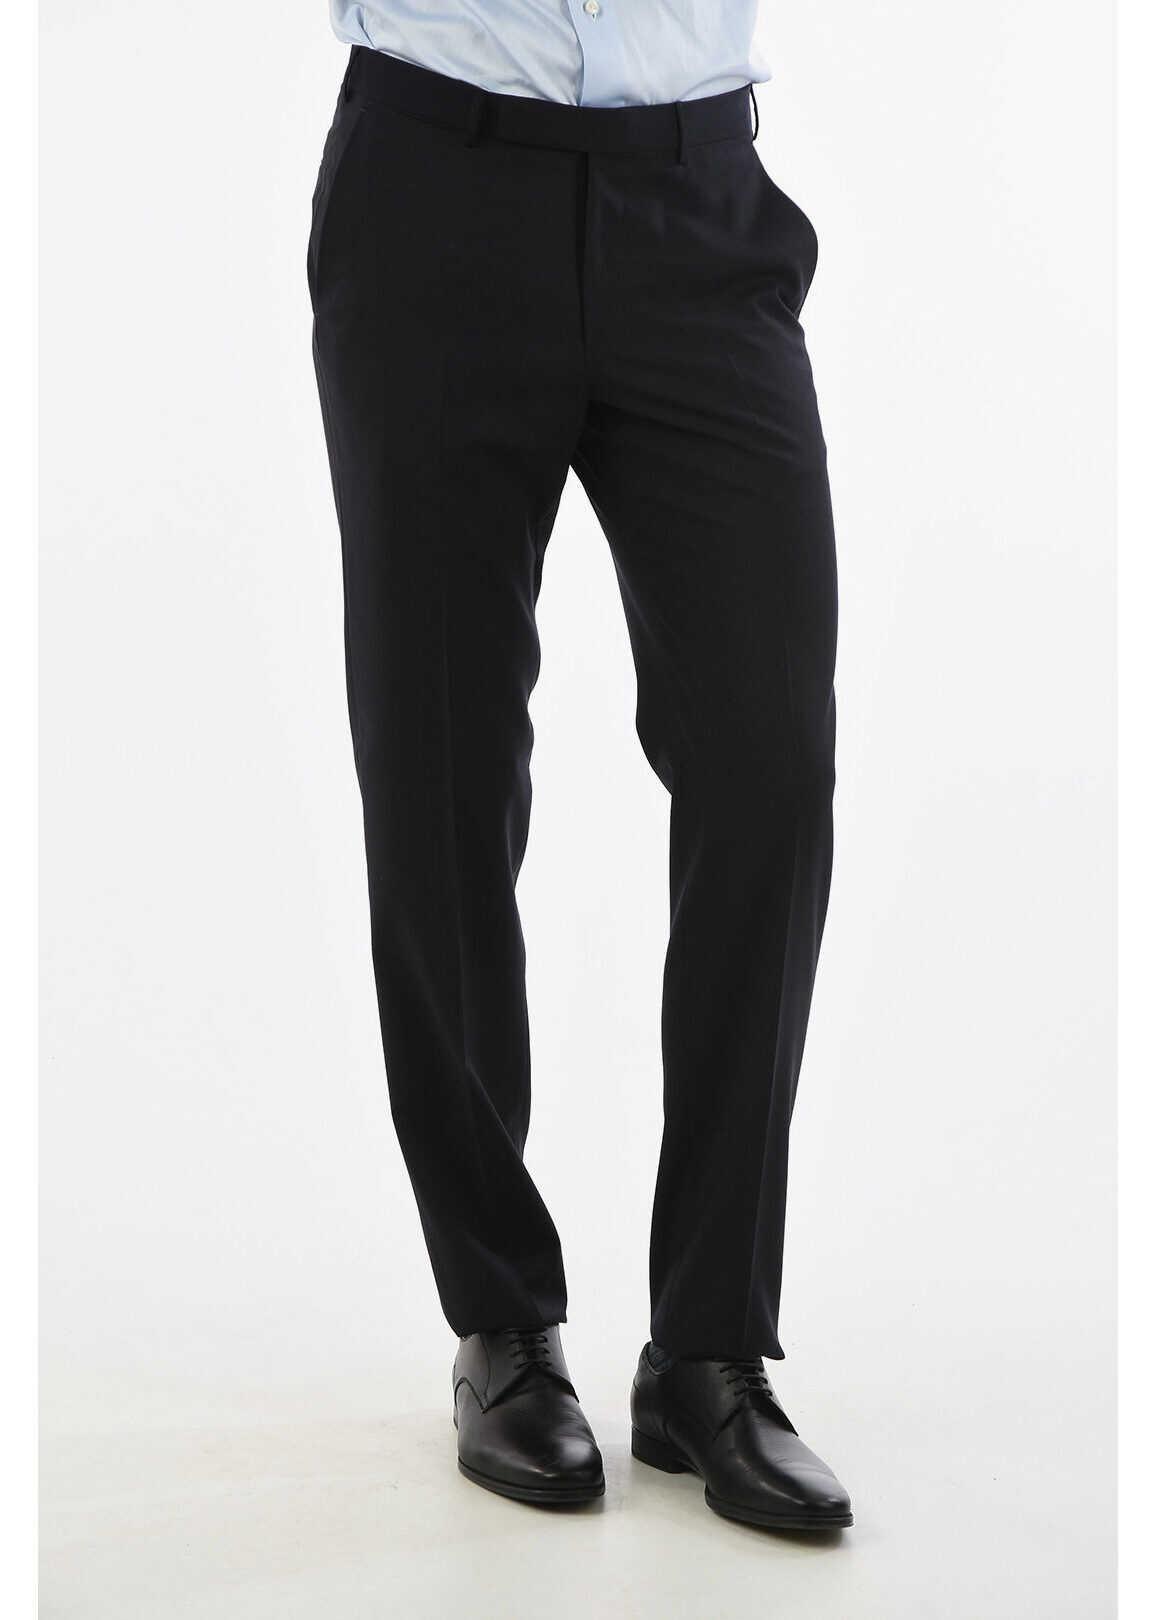 Ermenegildo Zegna EZ TAILORING Wool Regular Fit Pants with Belt Loops BLUE imagine